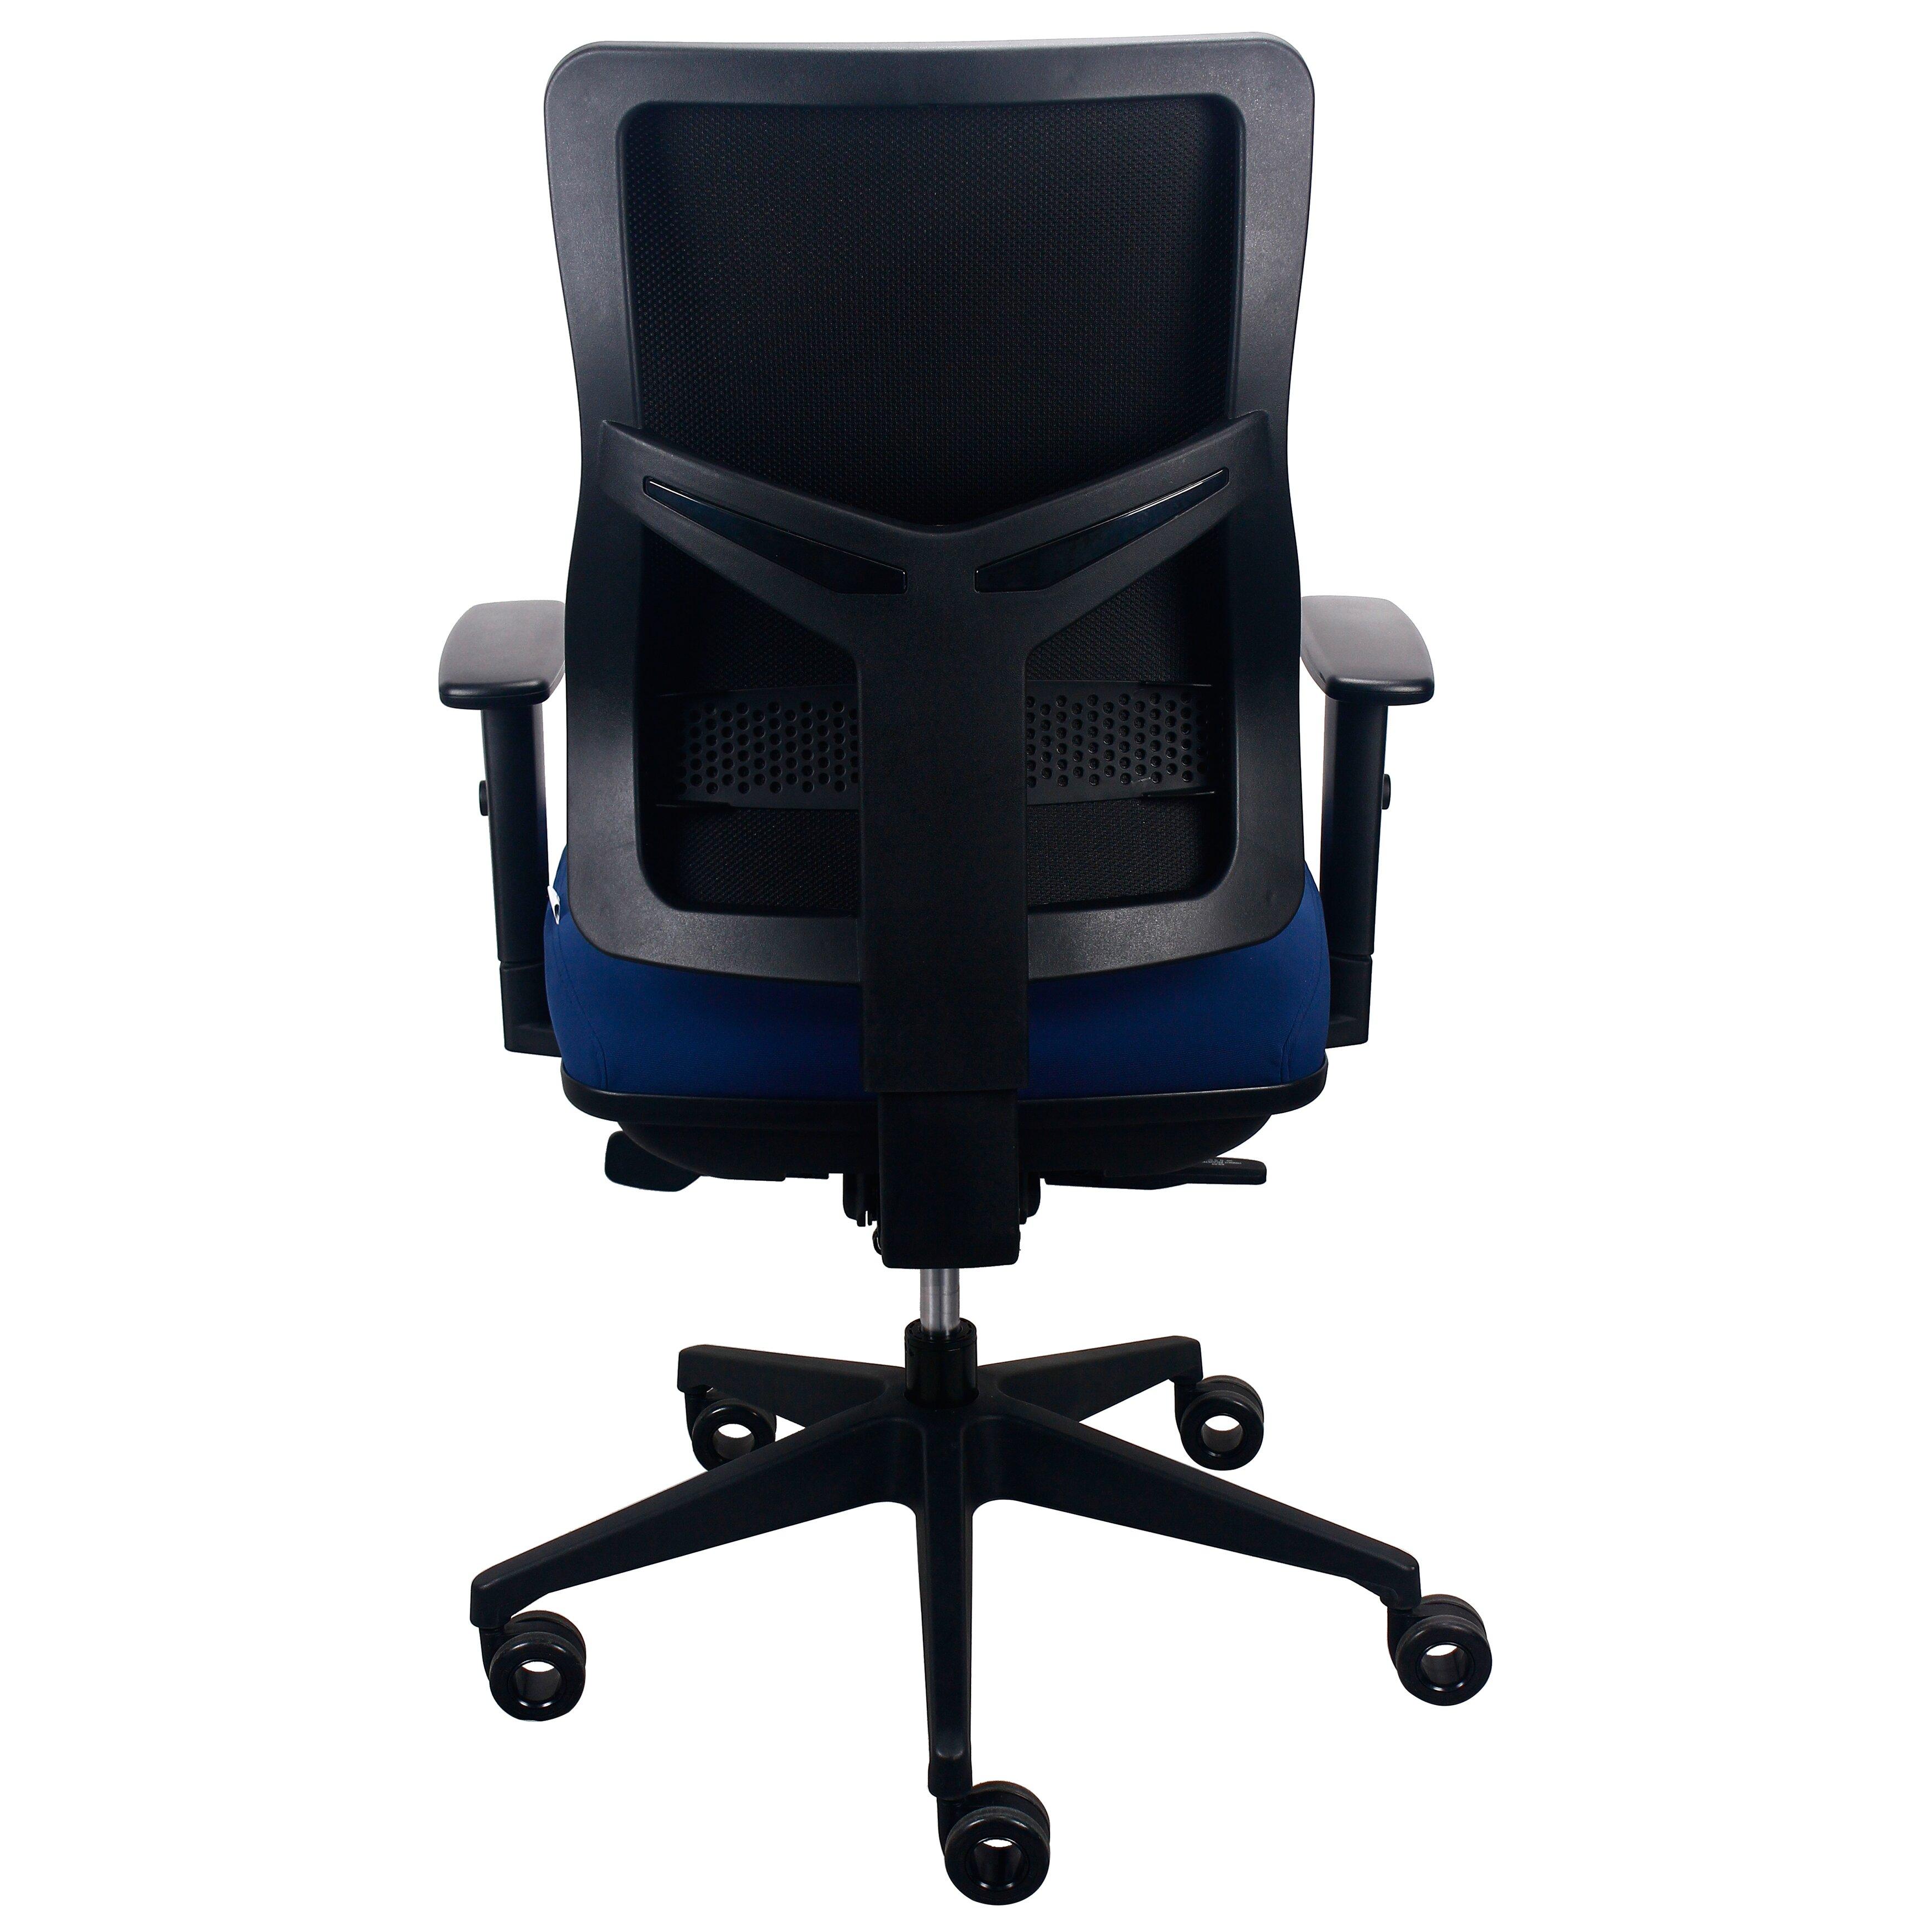 TempurPedic Desk Chair – Tempur-pedic Ergonomic Mesh Mid-back Office Chair